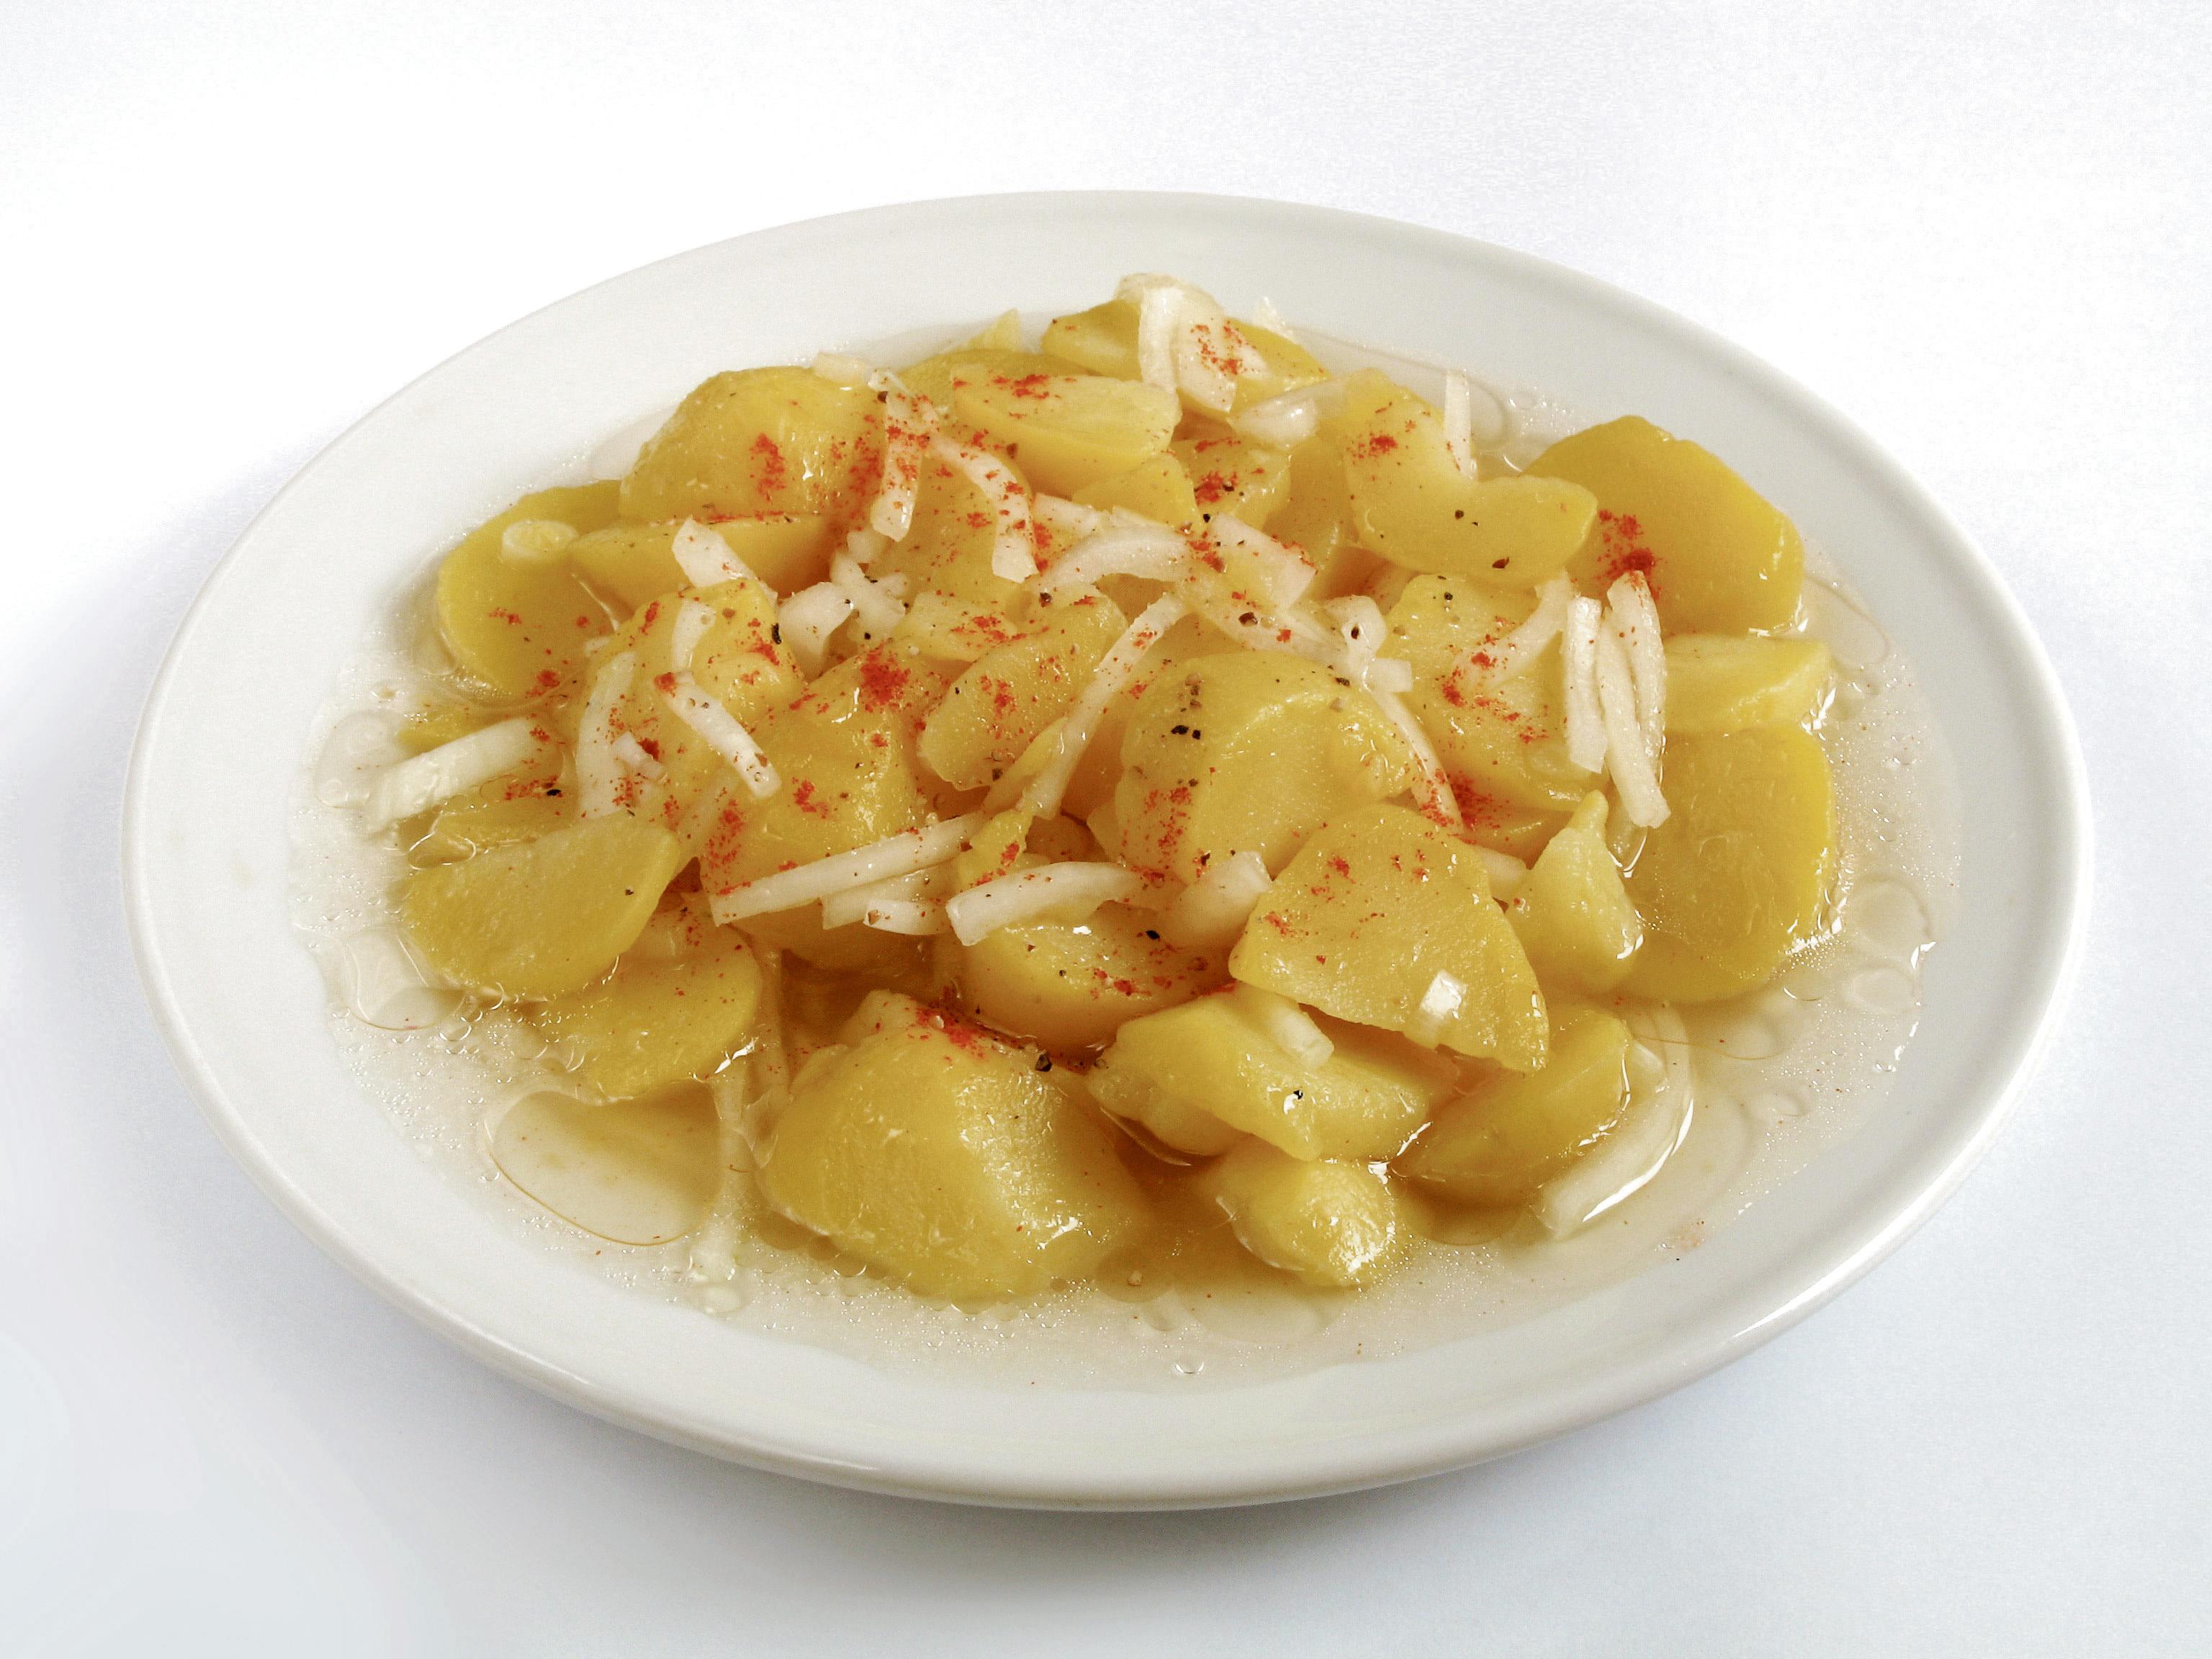 Image kartoffelsalat